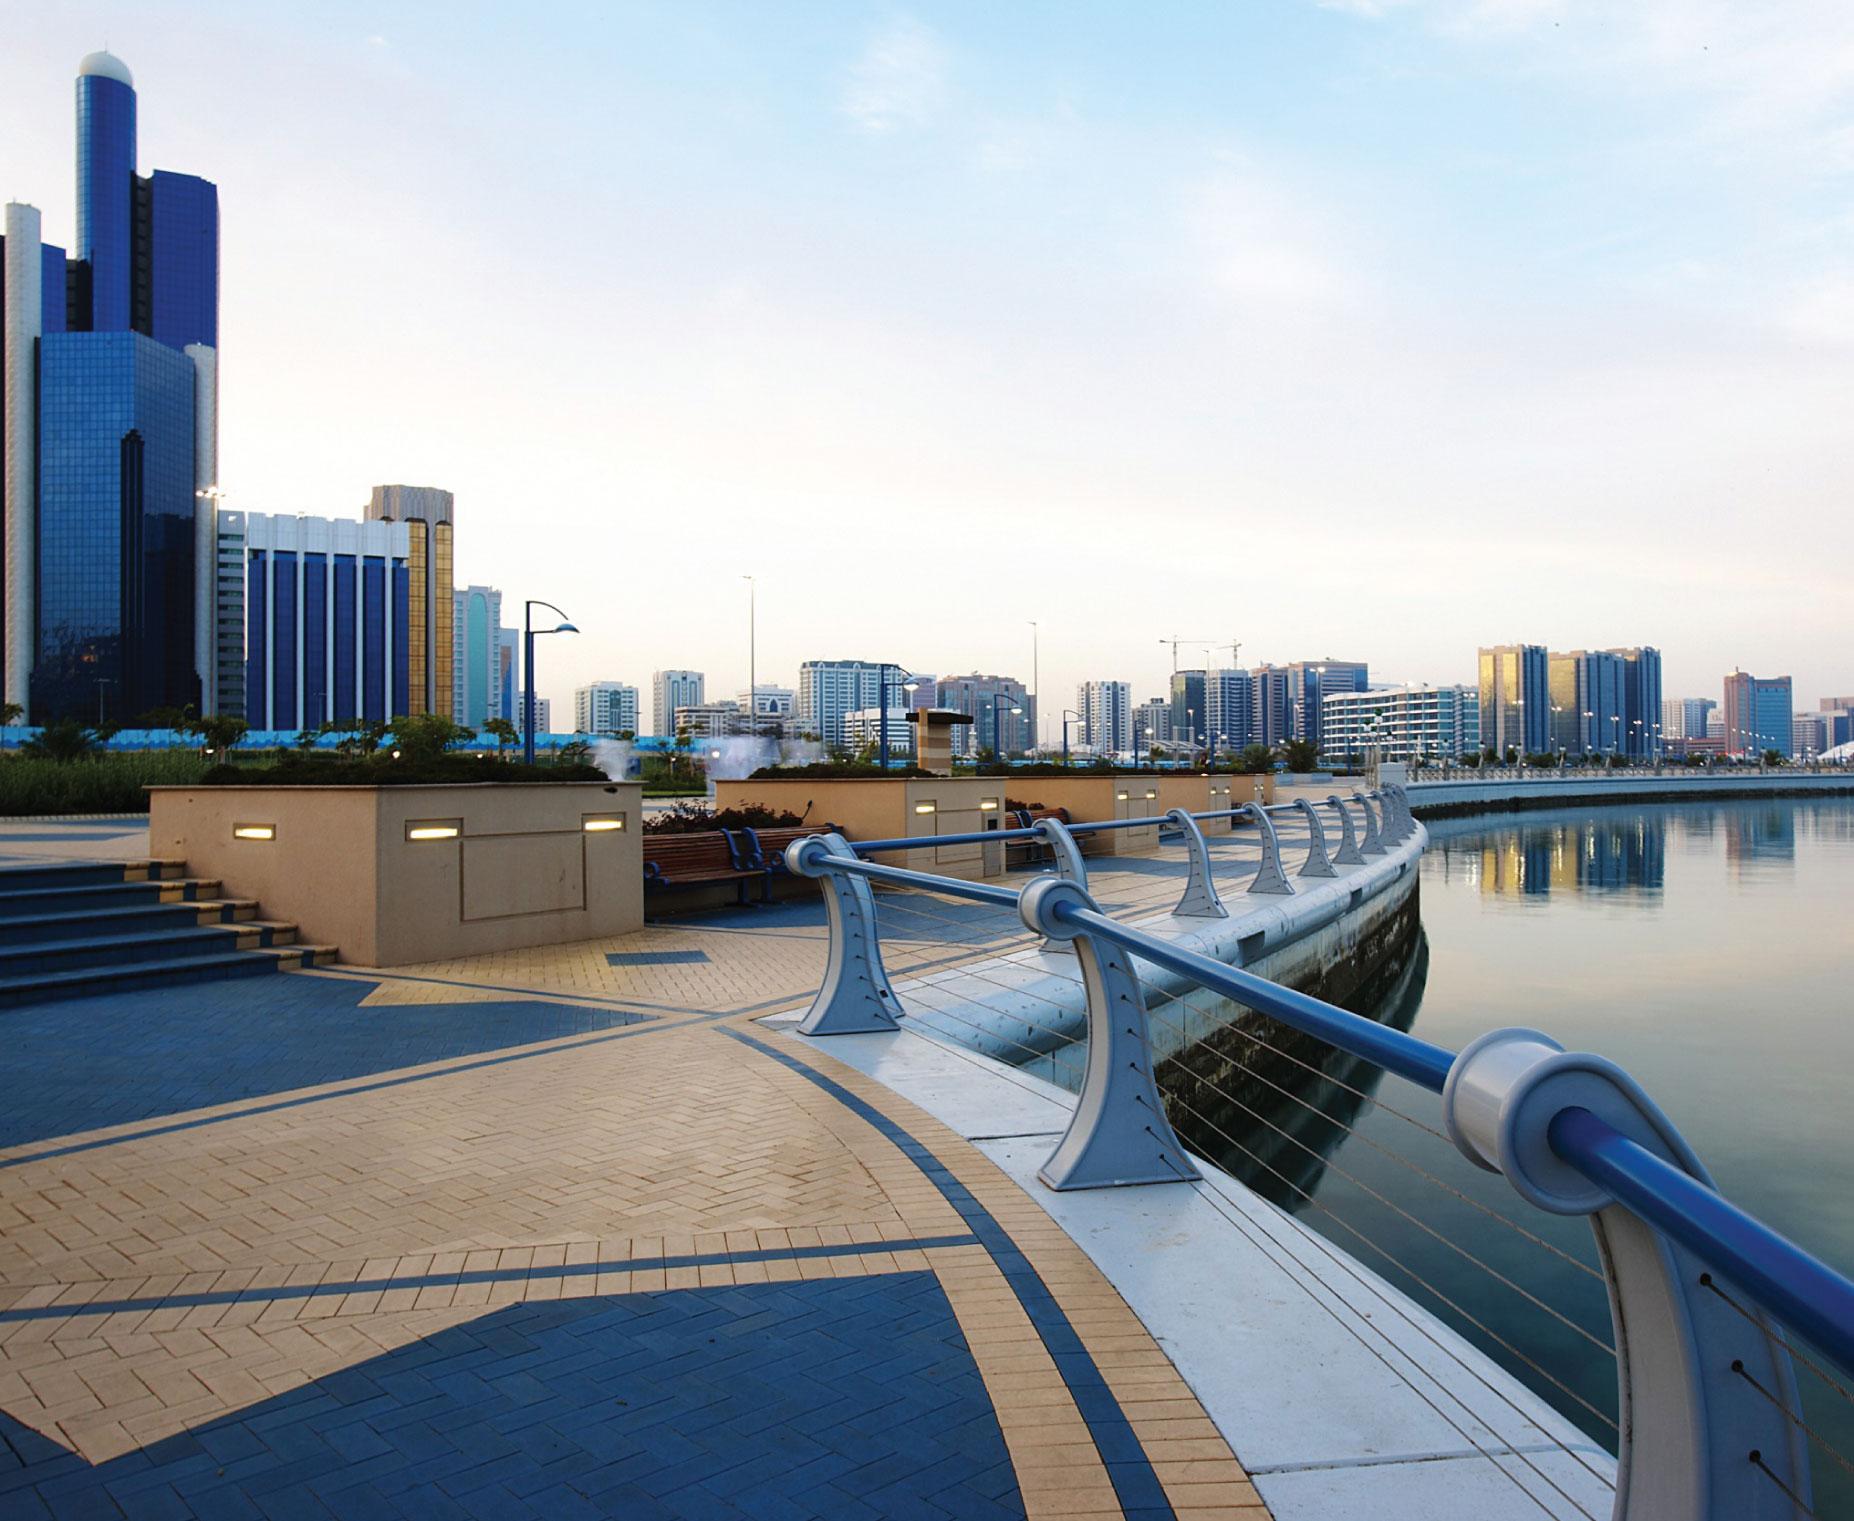 Abu Dhabi Corniche Waterfront View-01.jpg